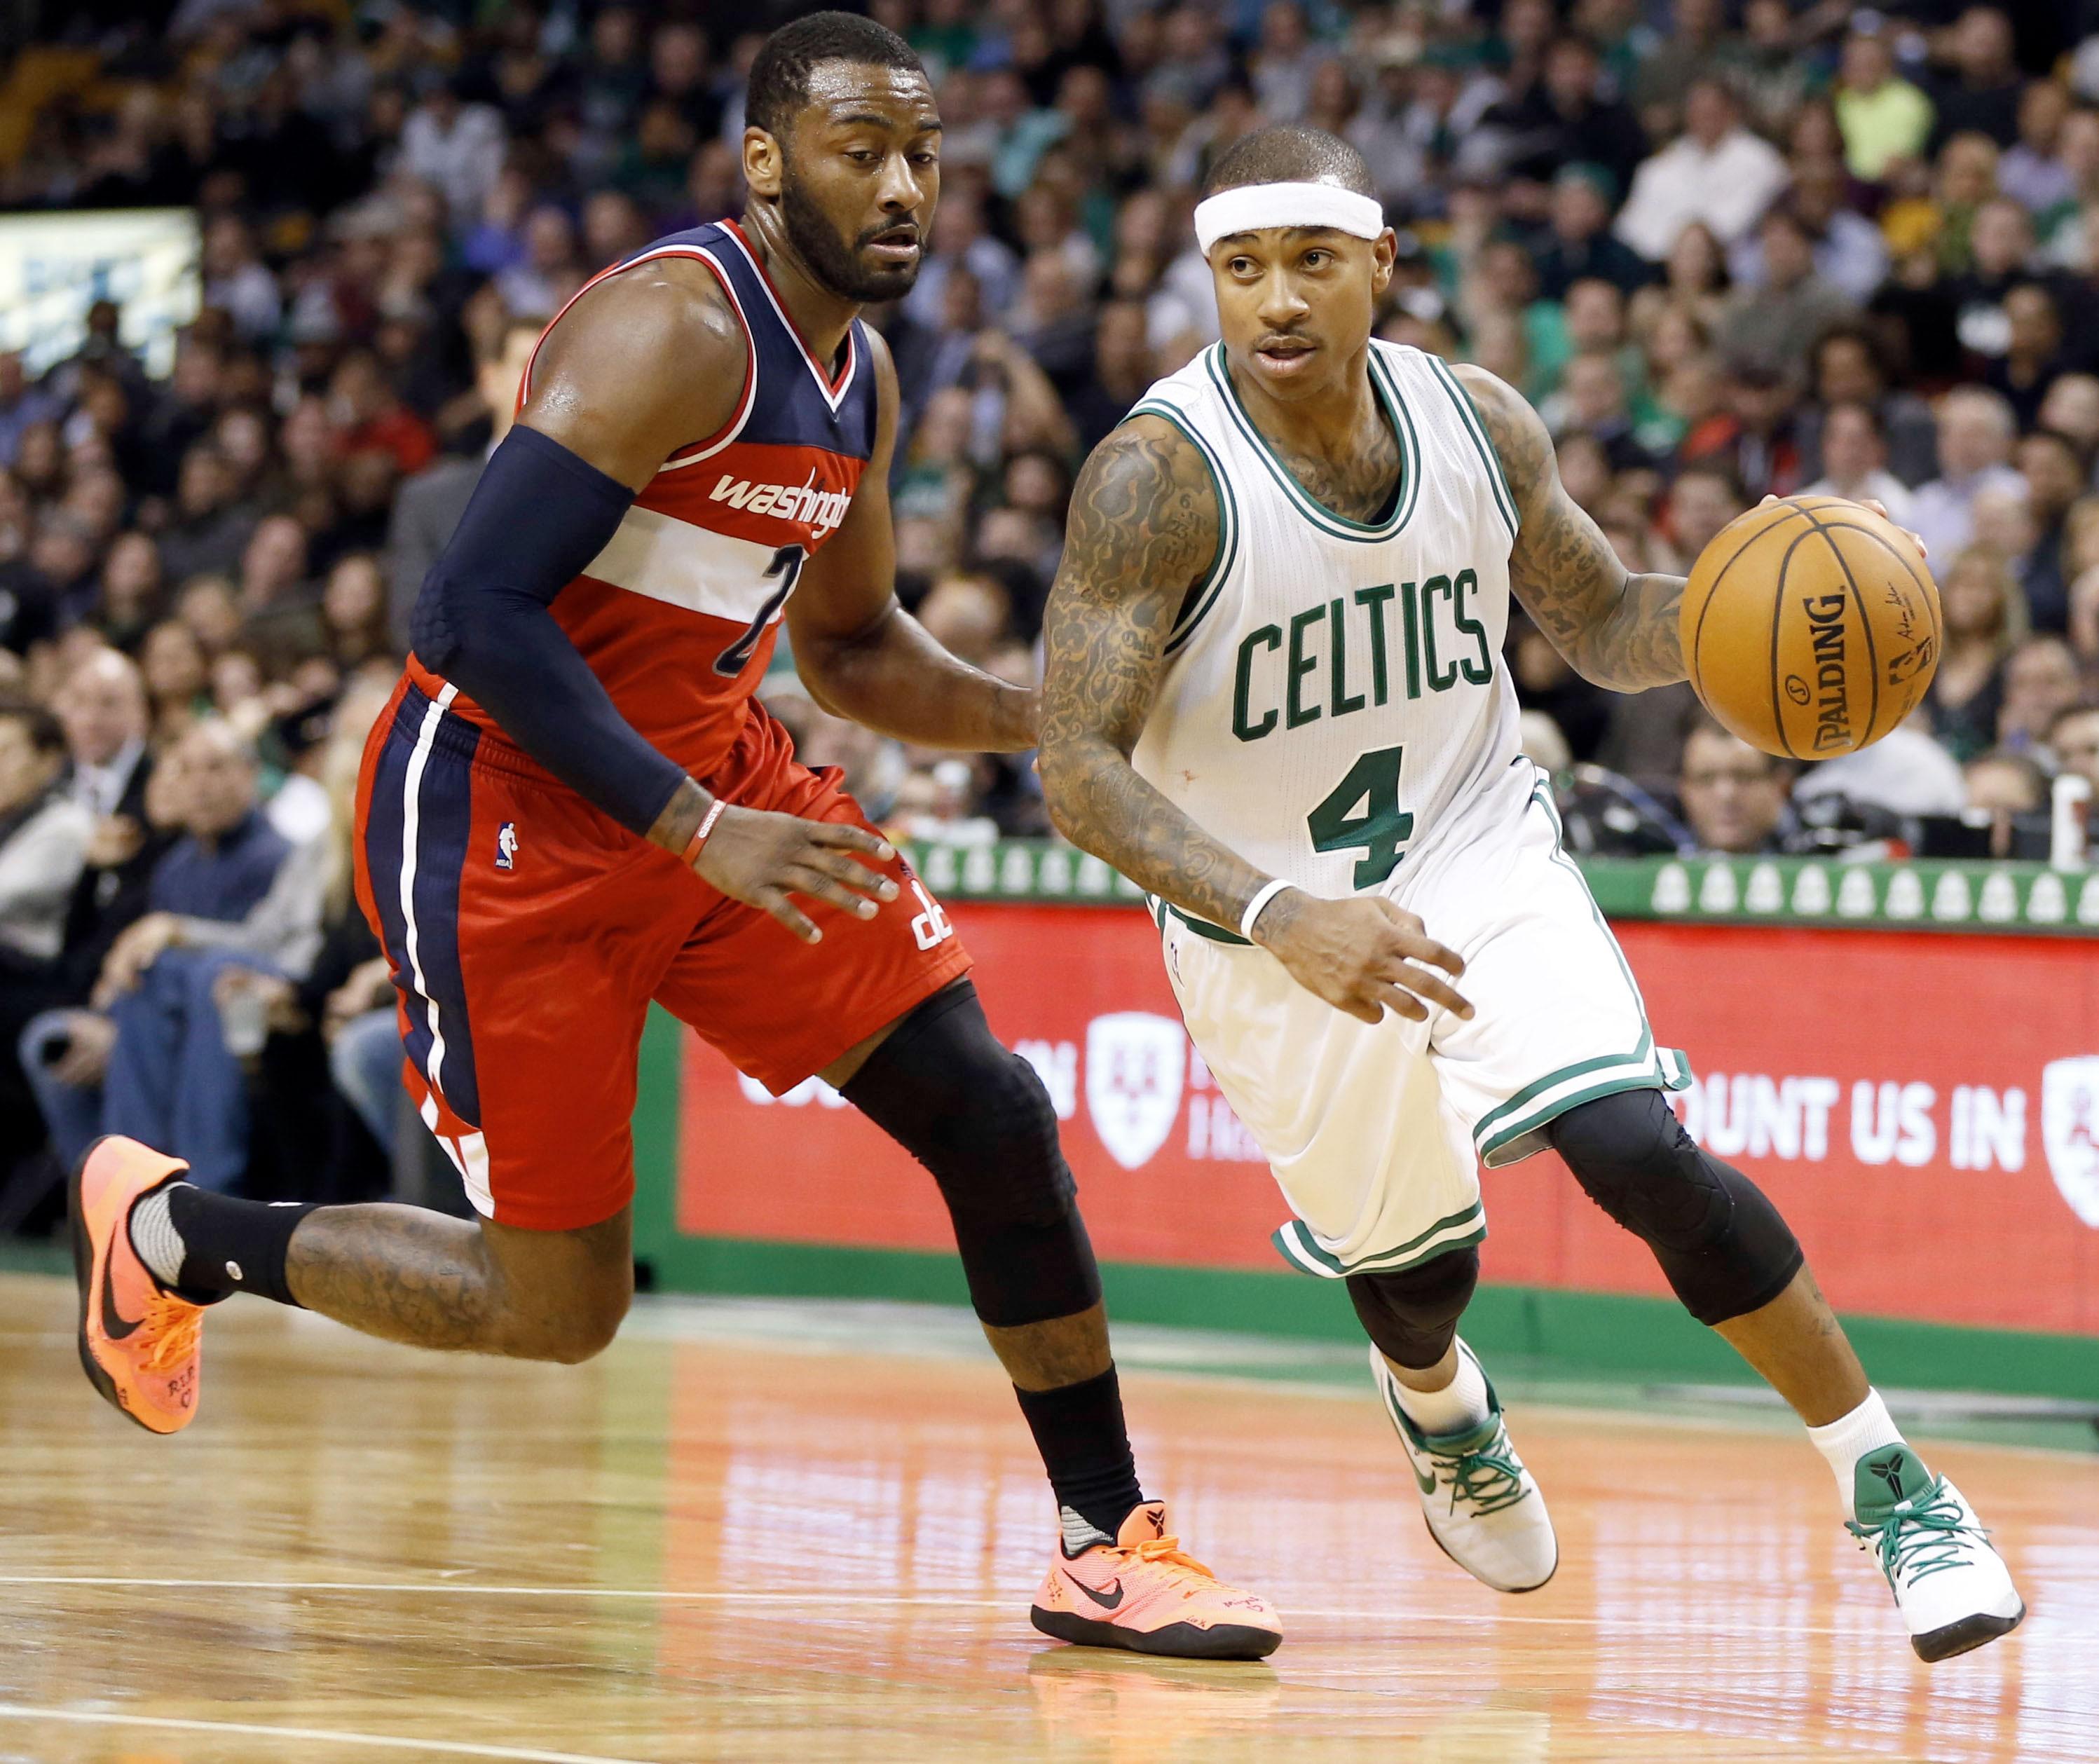 Boston Celtics Vs Washington Wizards NBA December 25 Match